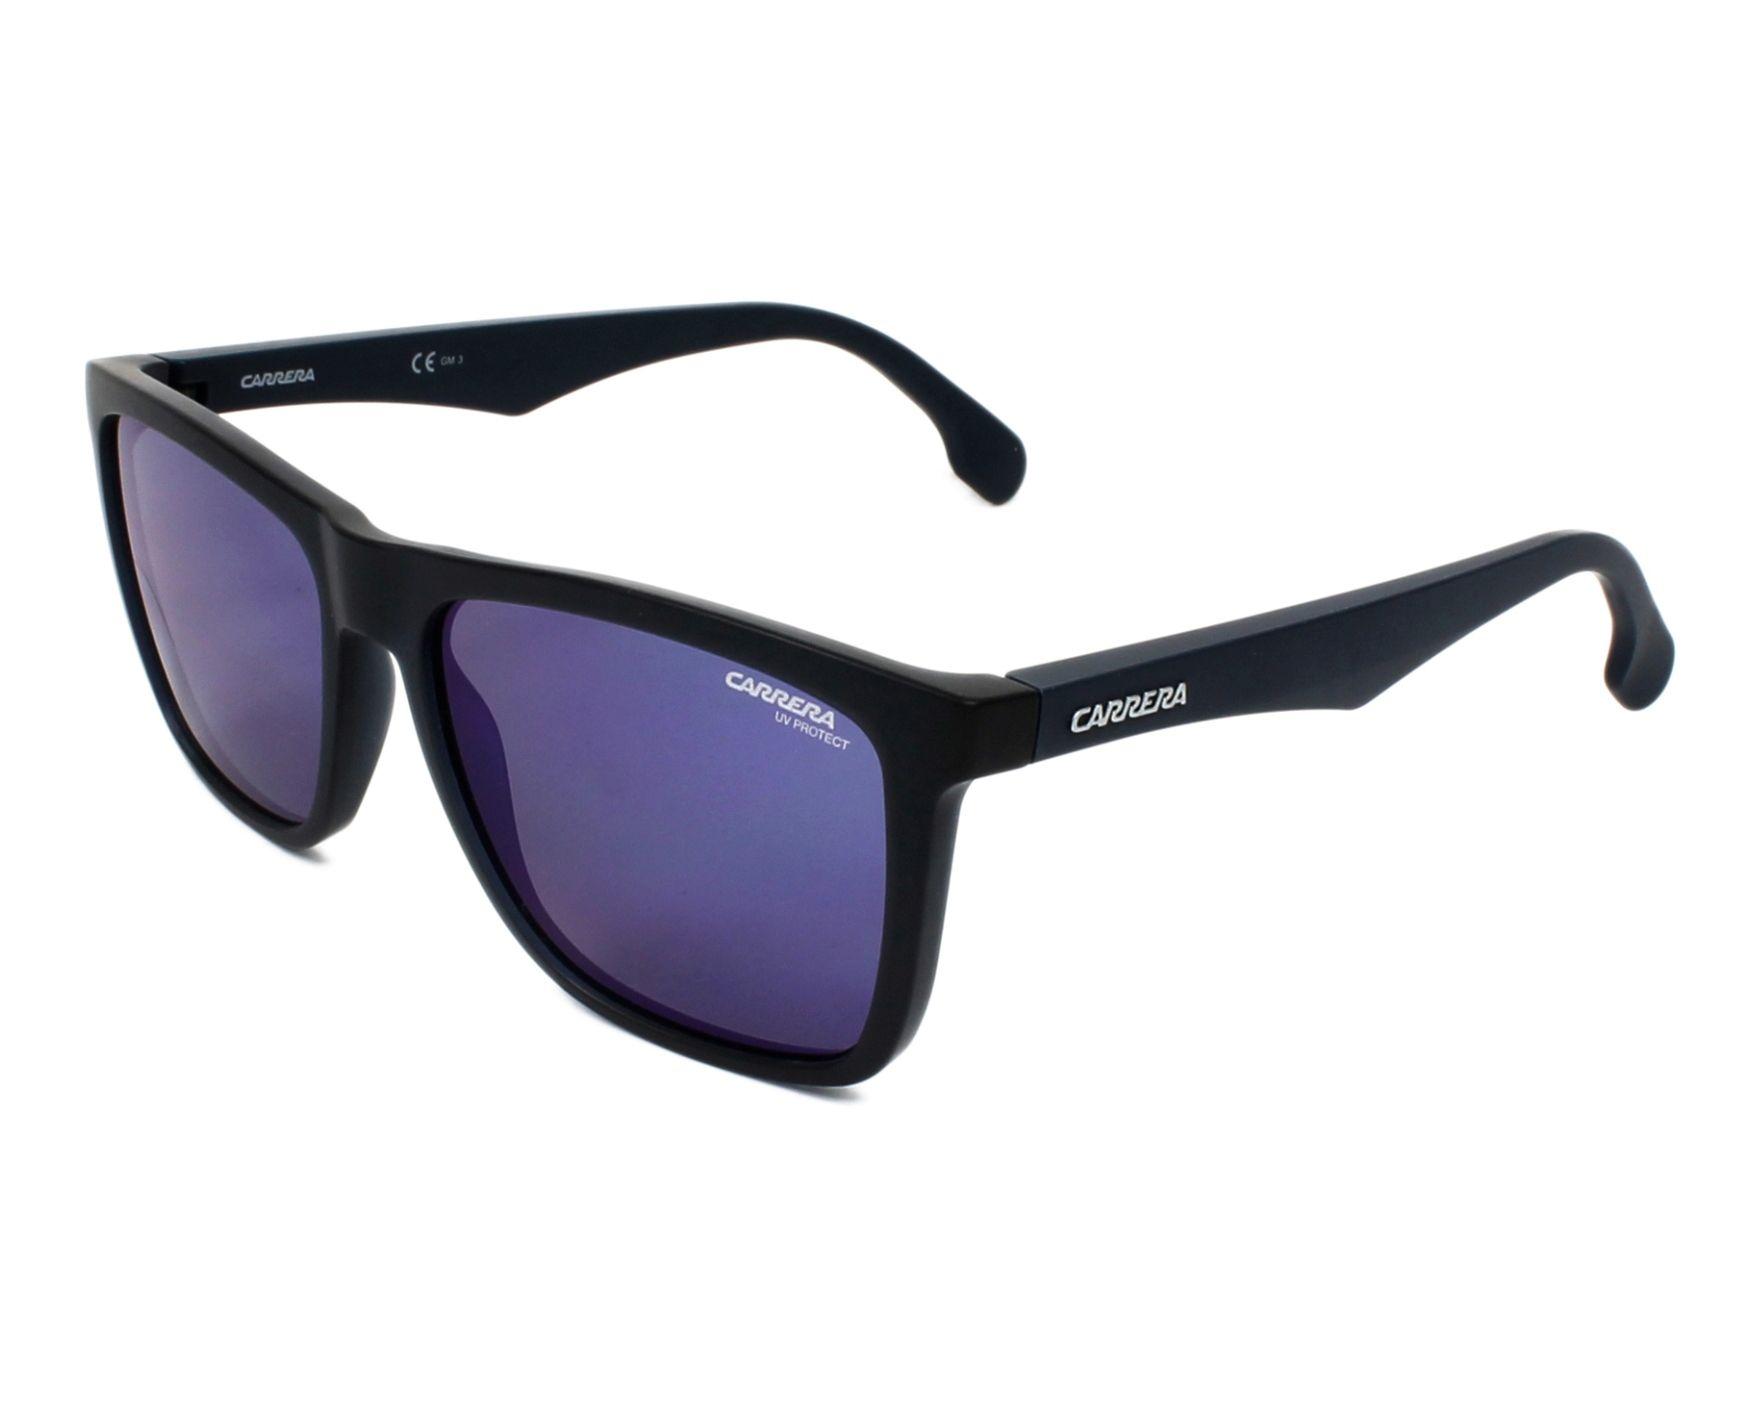 Carrera 5041/S rct xt Sonnenbrille XJx08F